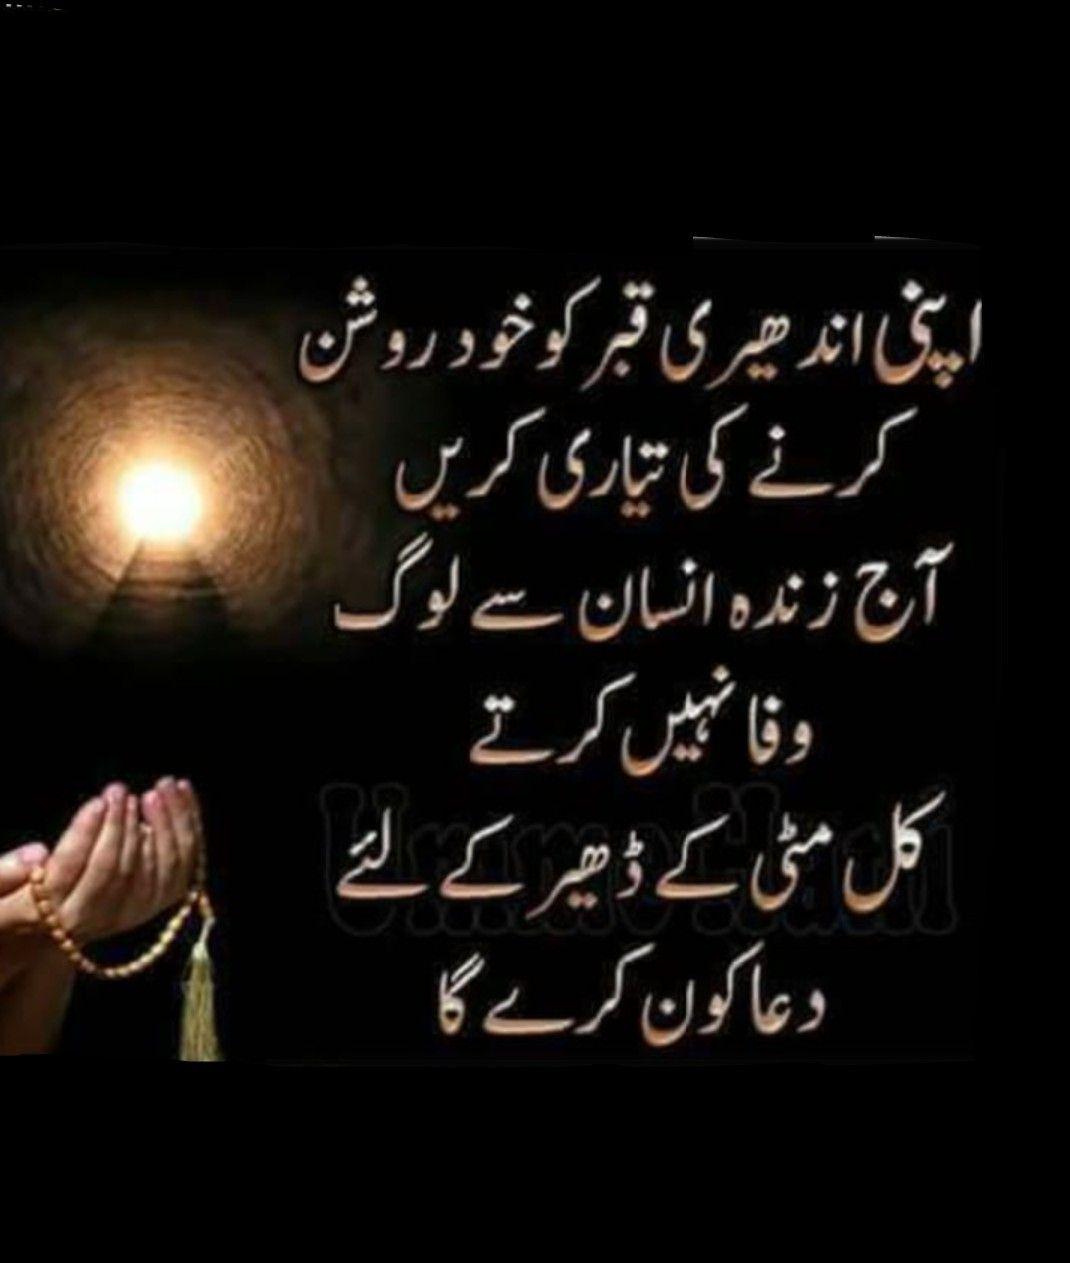 Apni Qabar Ko Khud Roshan Karen Islamic Inspirational Quotes Queen Quotes Beautiful Quotes